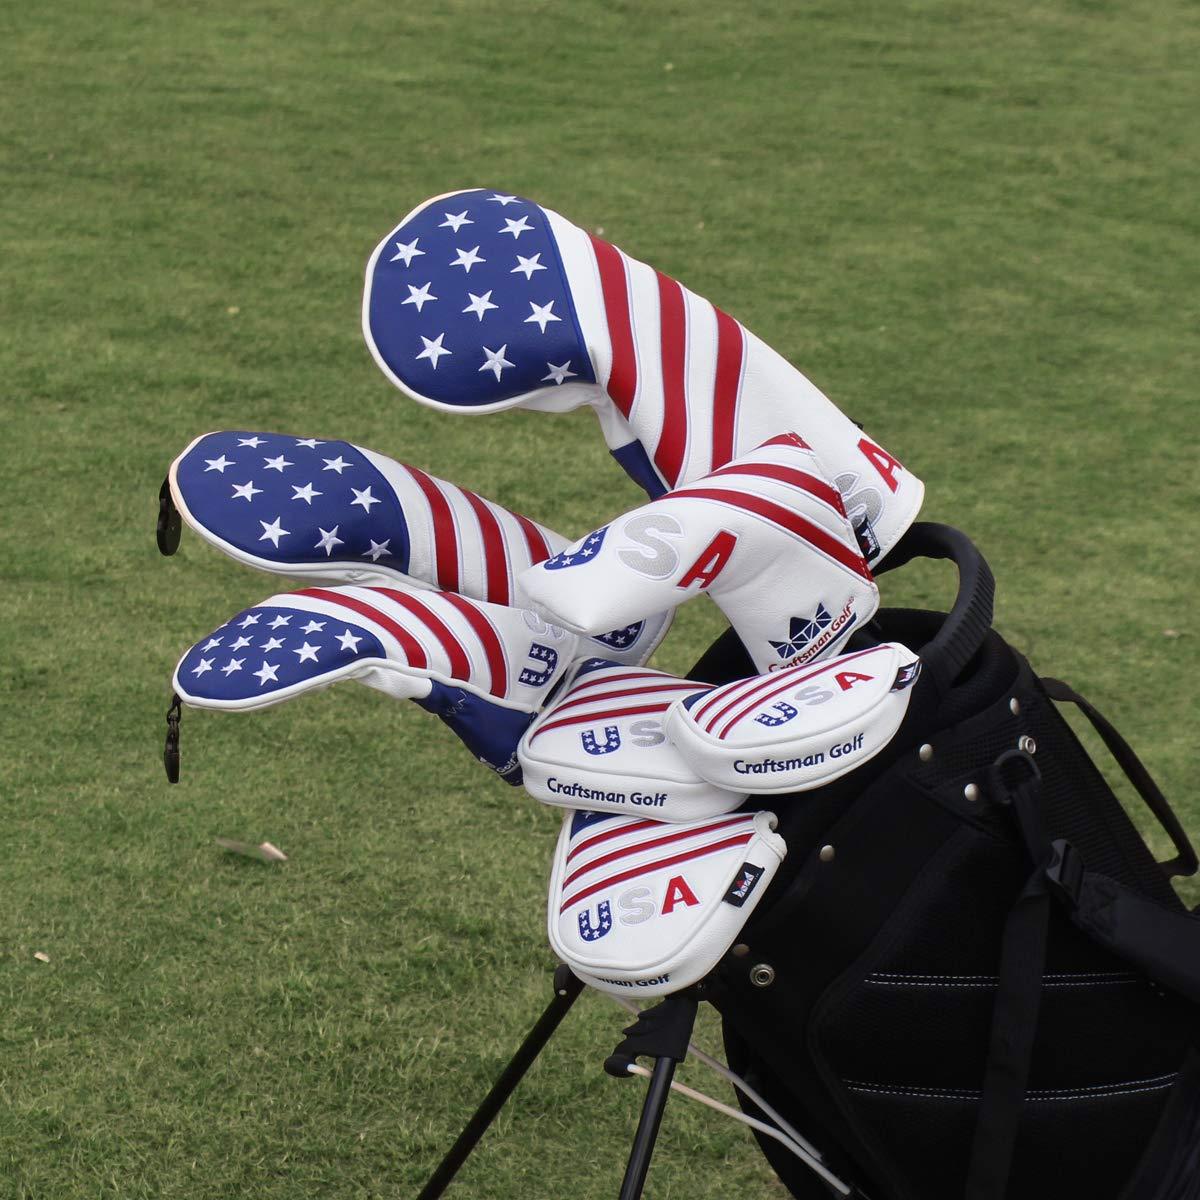 Amazon.com: Craftsman Golf Red/White/Blue USA Flag Driver ...